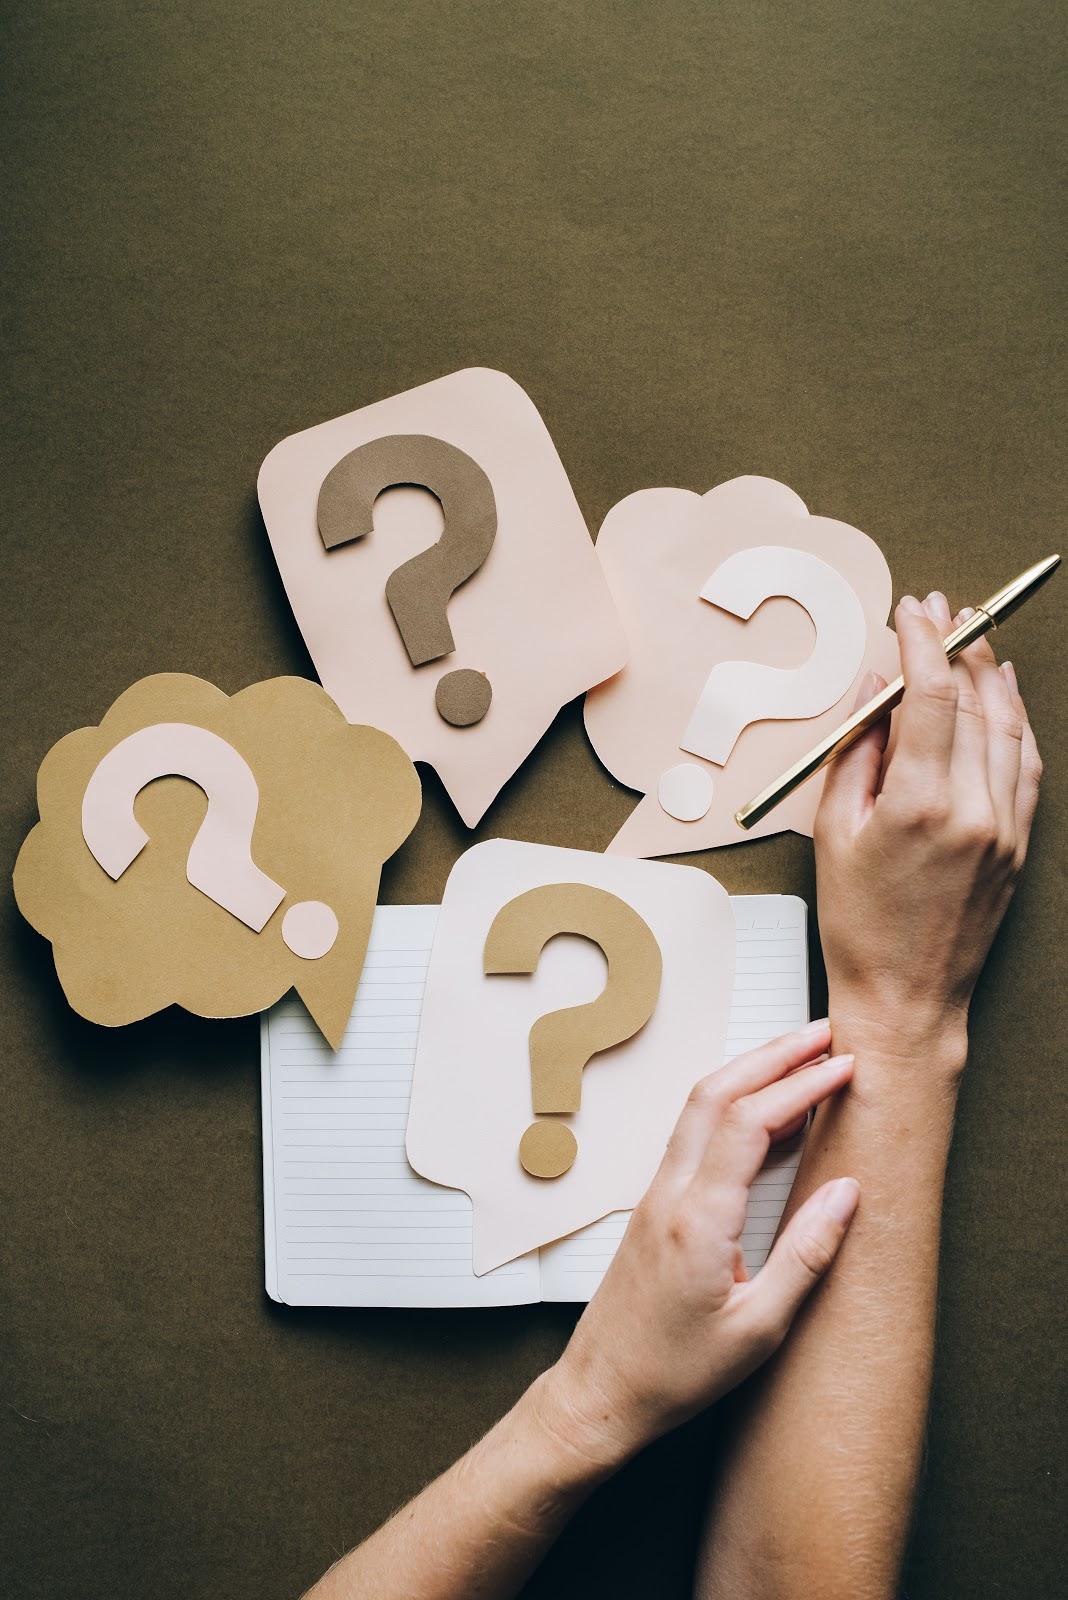 O čemu se tu radi - senilna demencija, demencija ili Alzheimerova bolest?